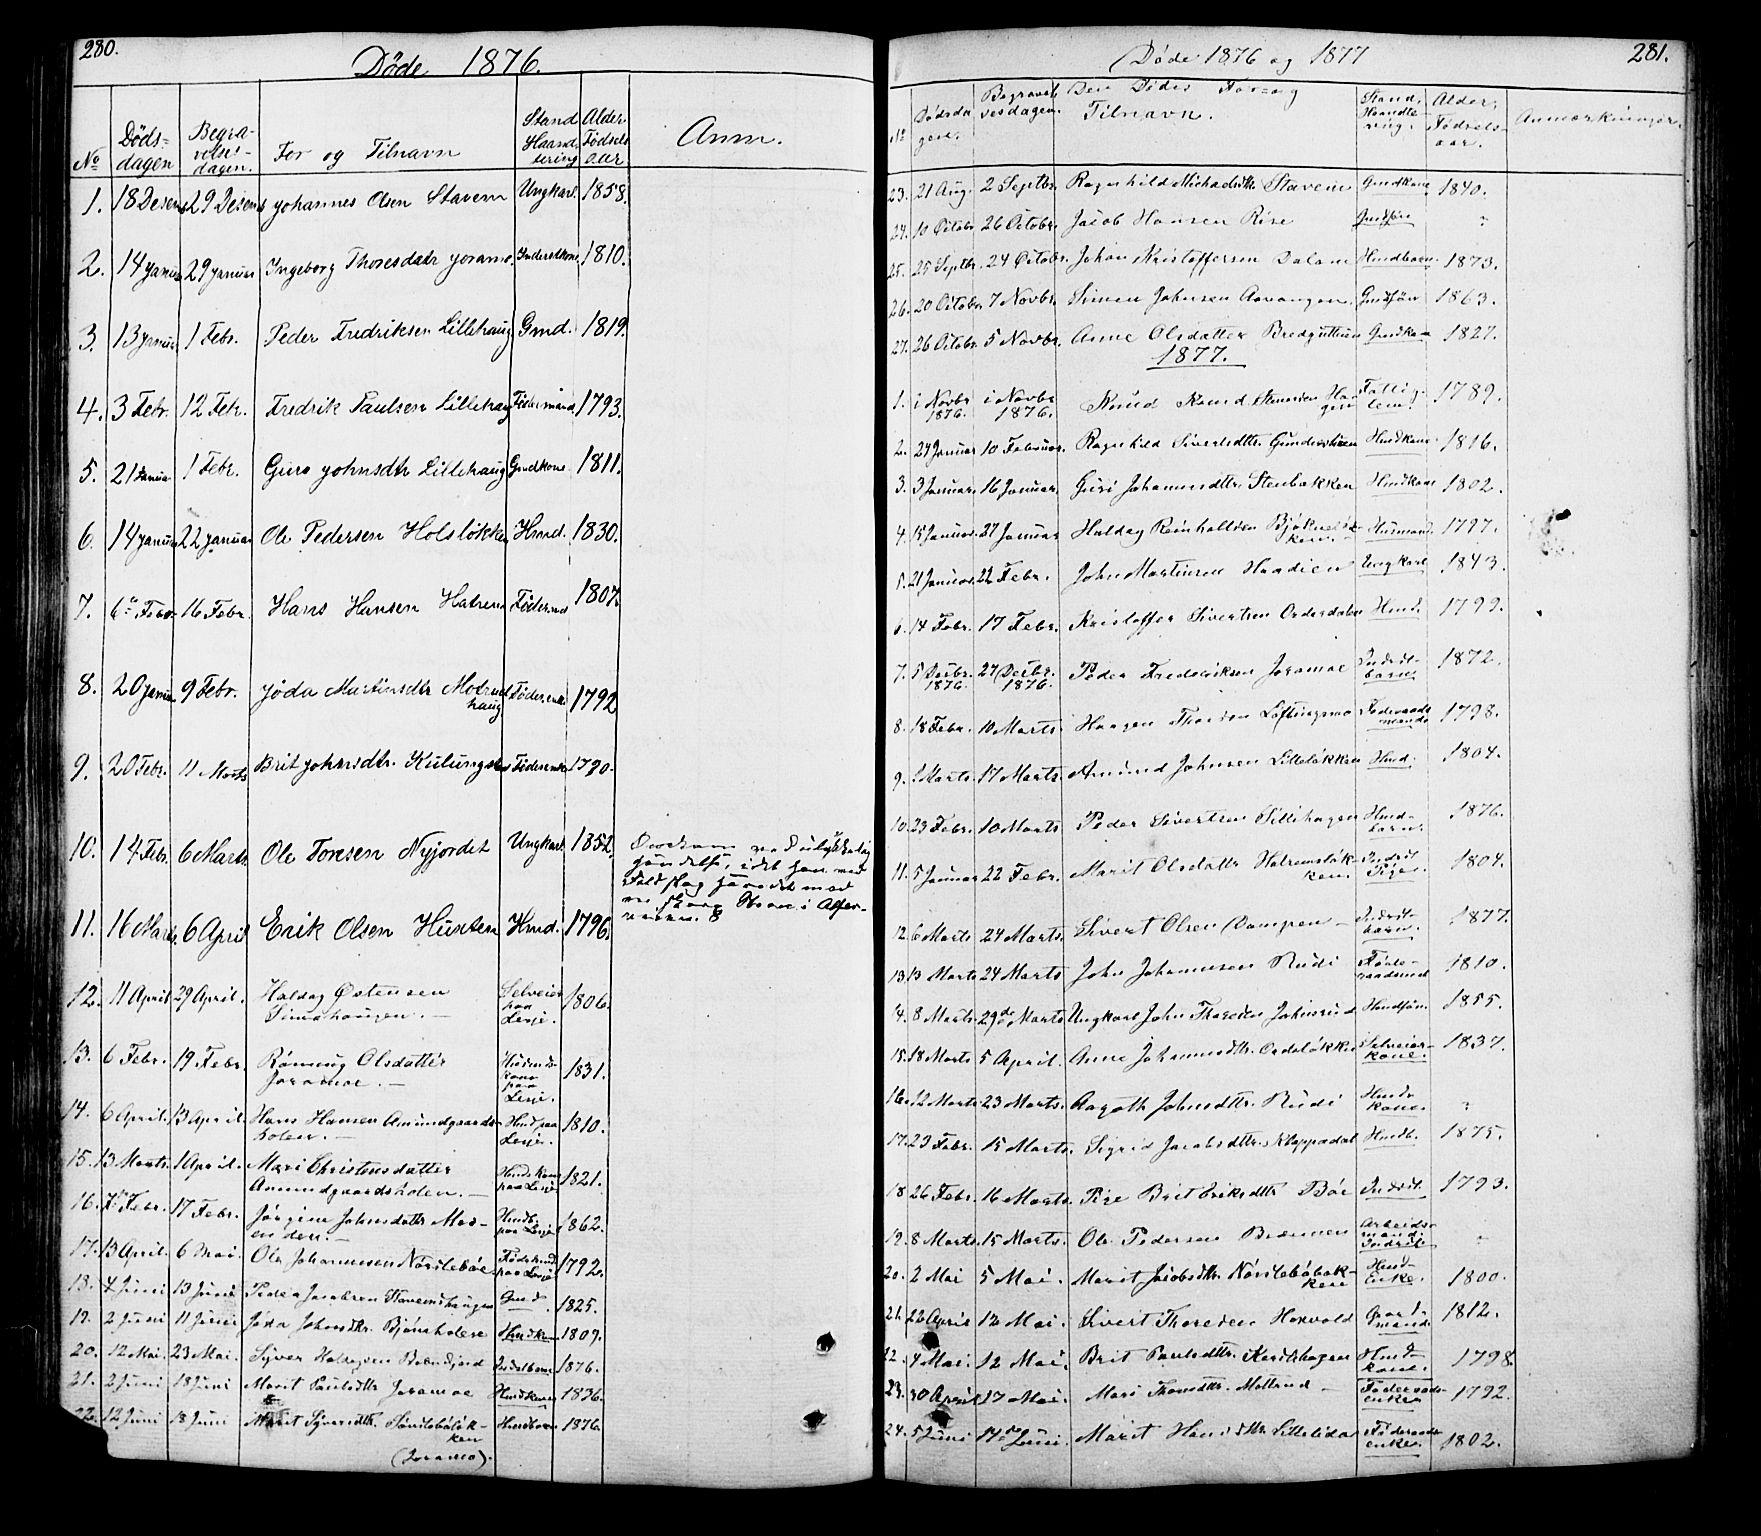 SAH, Lesja prestekontor, Klokkerbok nr. 5, 1850-1894, s. 280-281